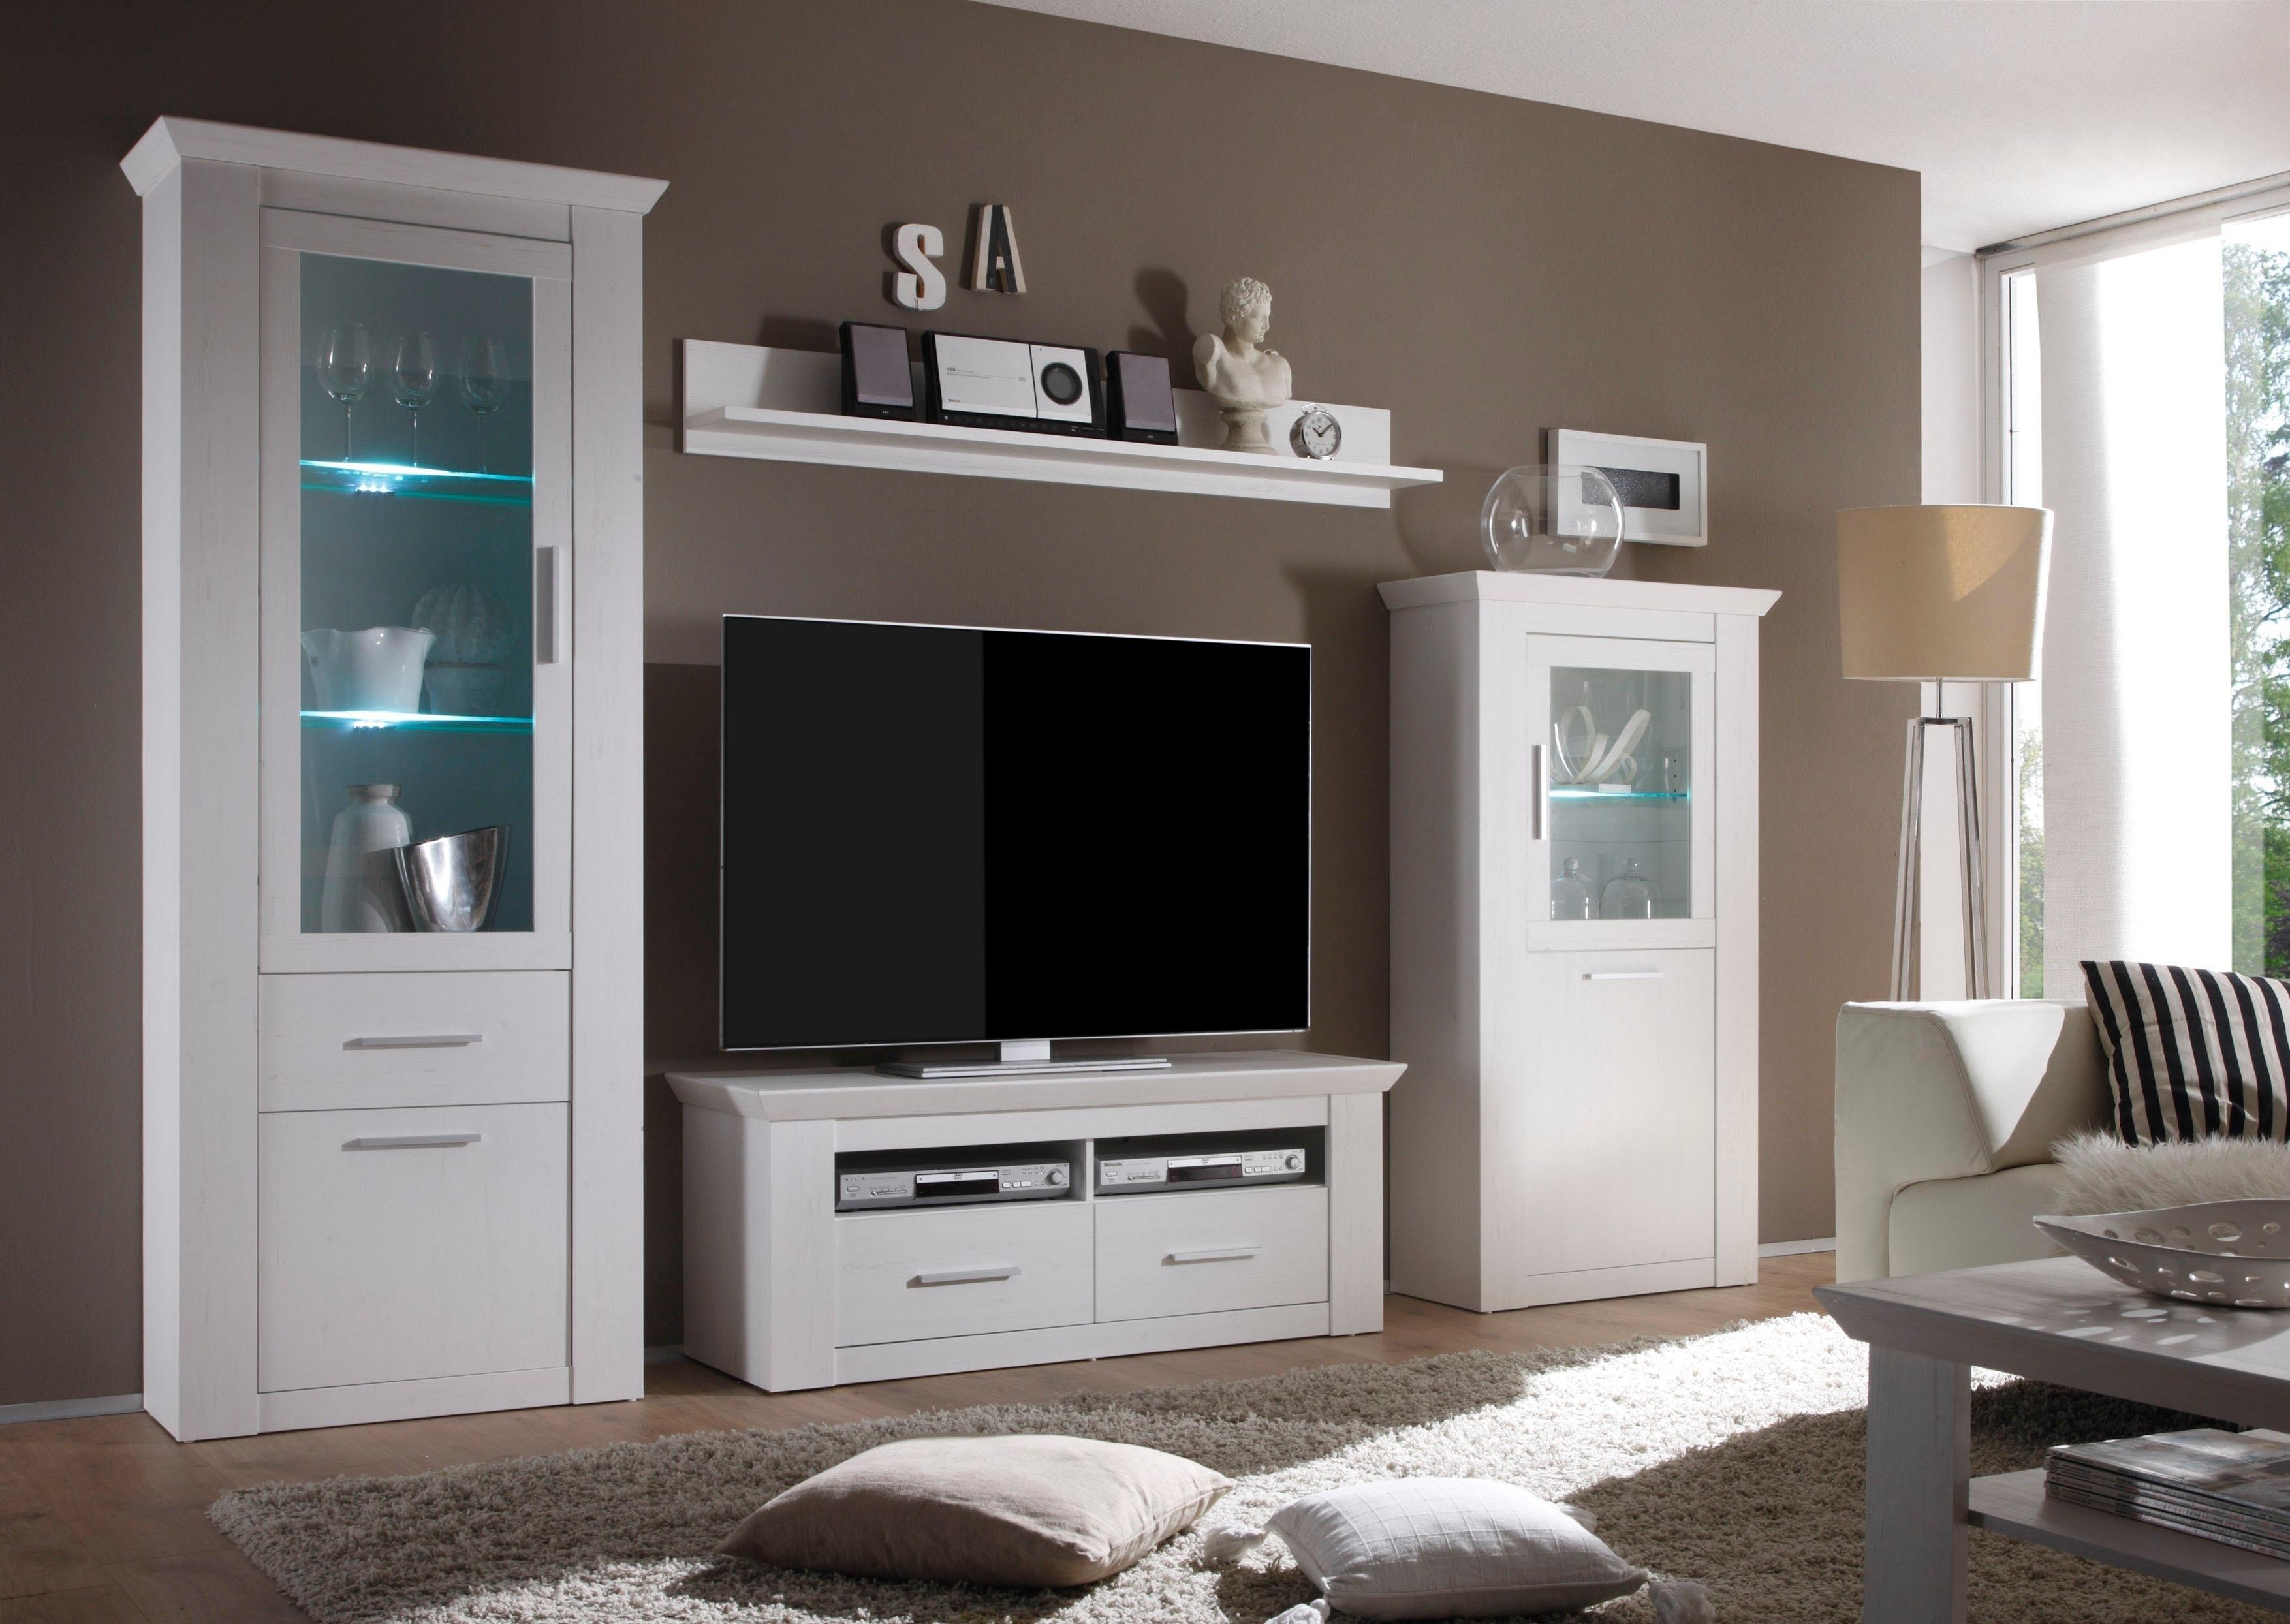 Fotoplank Wit 150 Cm.Home Affaire Wandplank 150 Cm Online Verkrijgbaar Otto